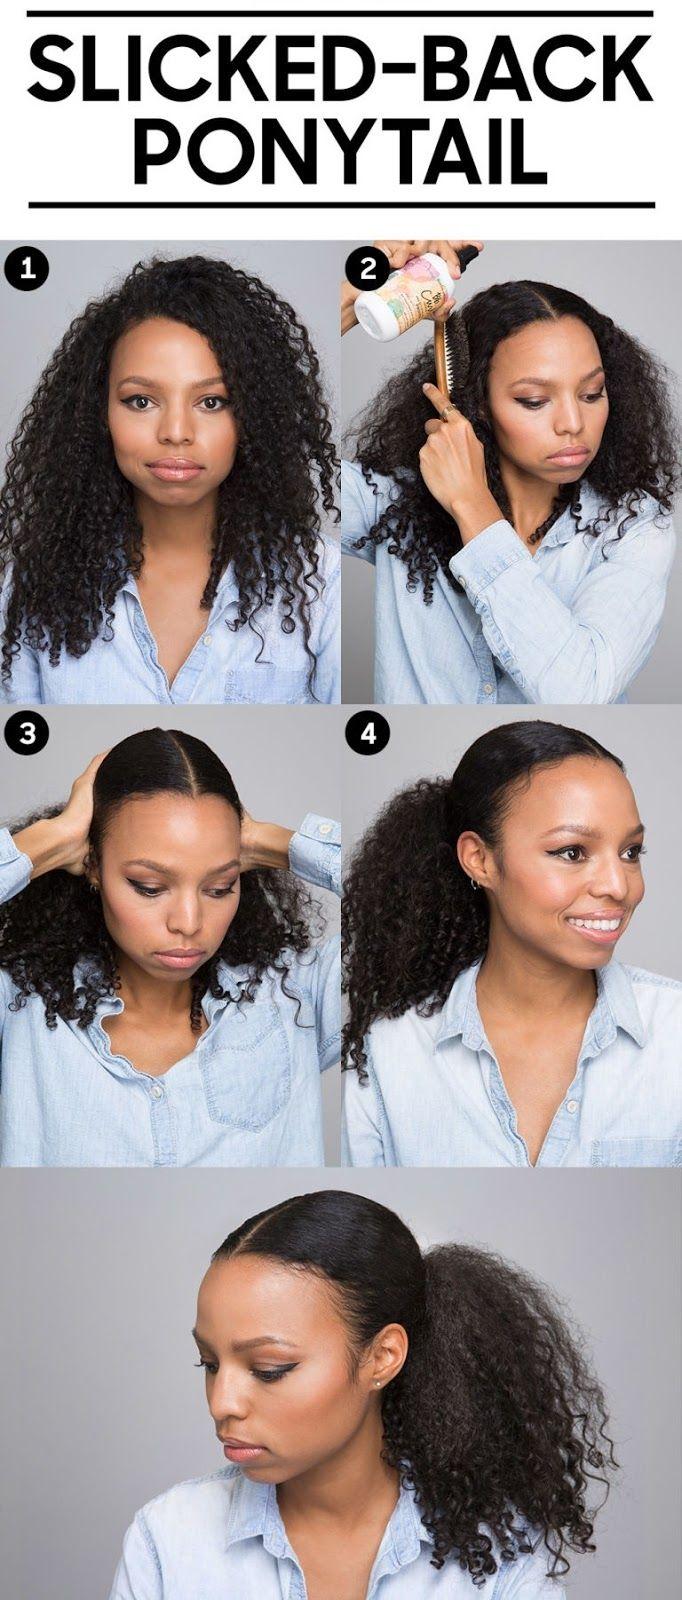 8 cutest curly hairstyles ideas | Ηαιr § locκs | cute curly